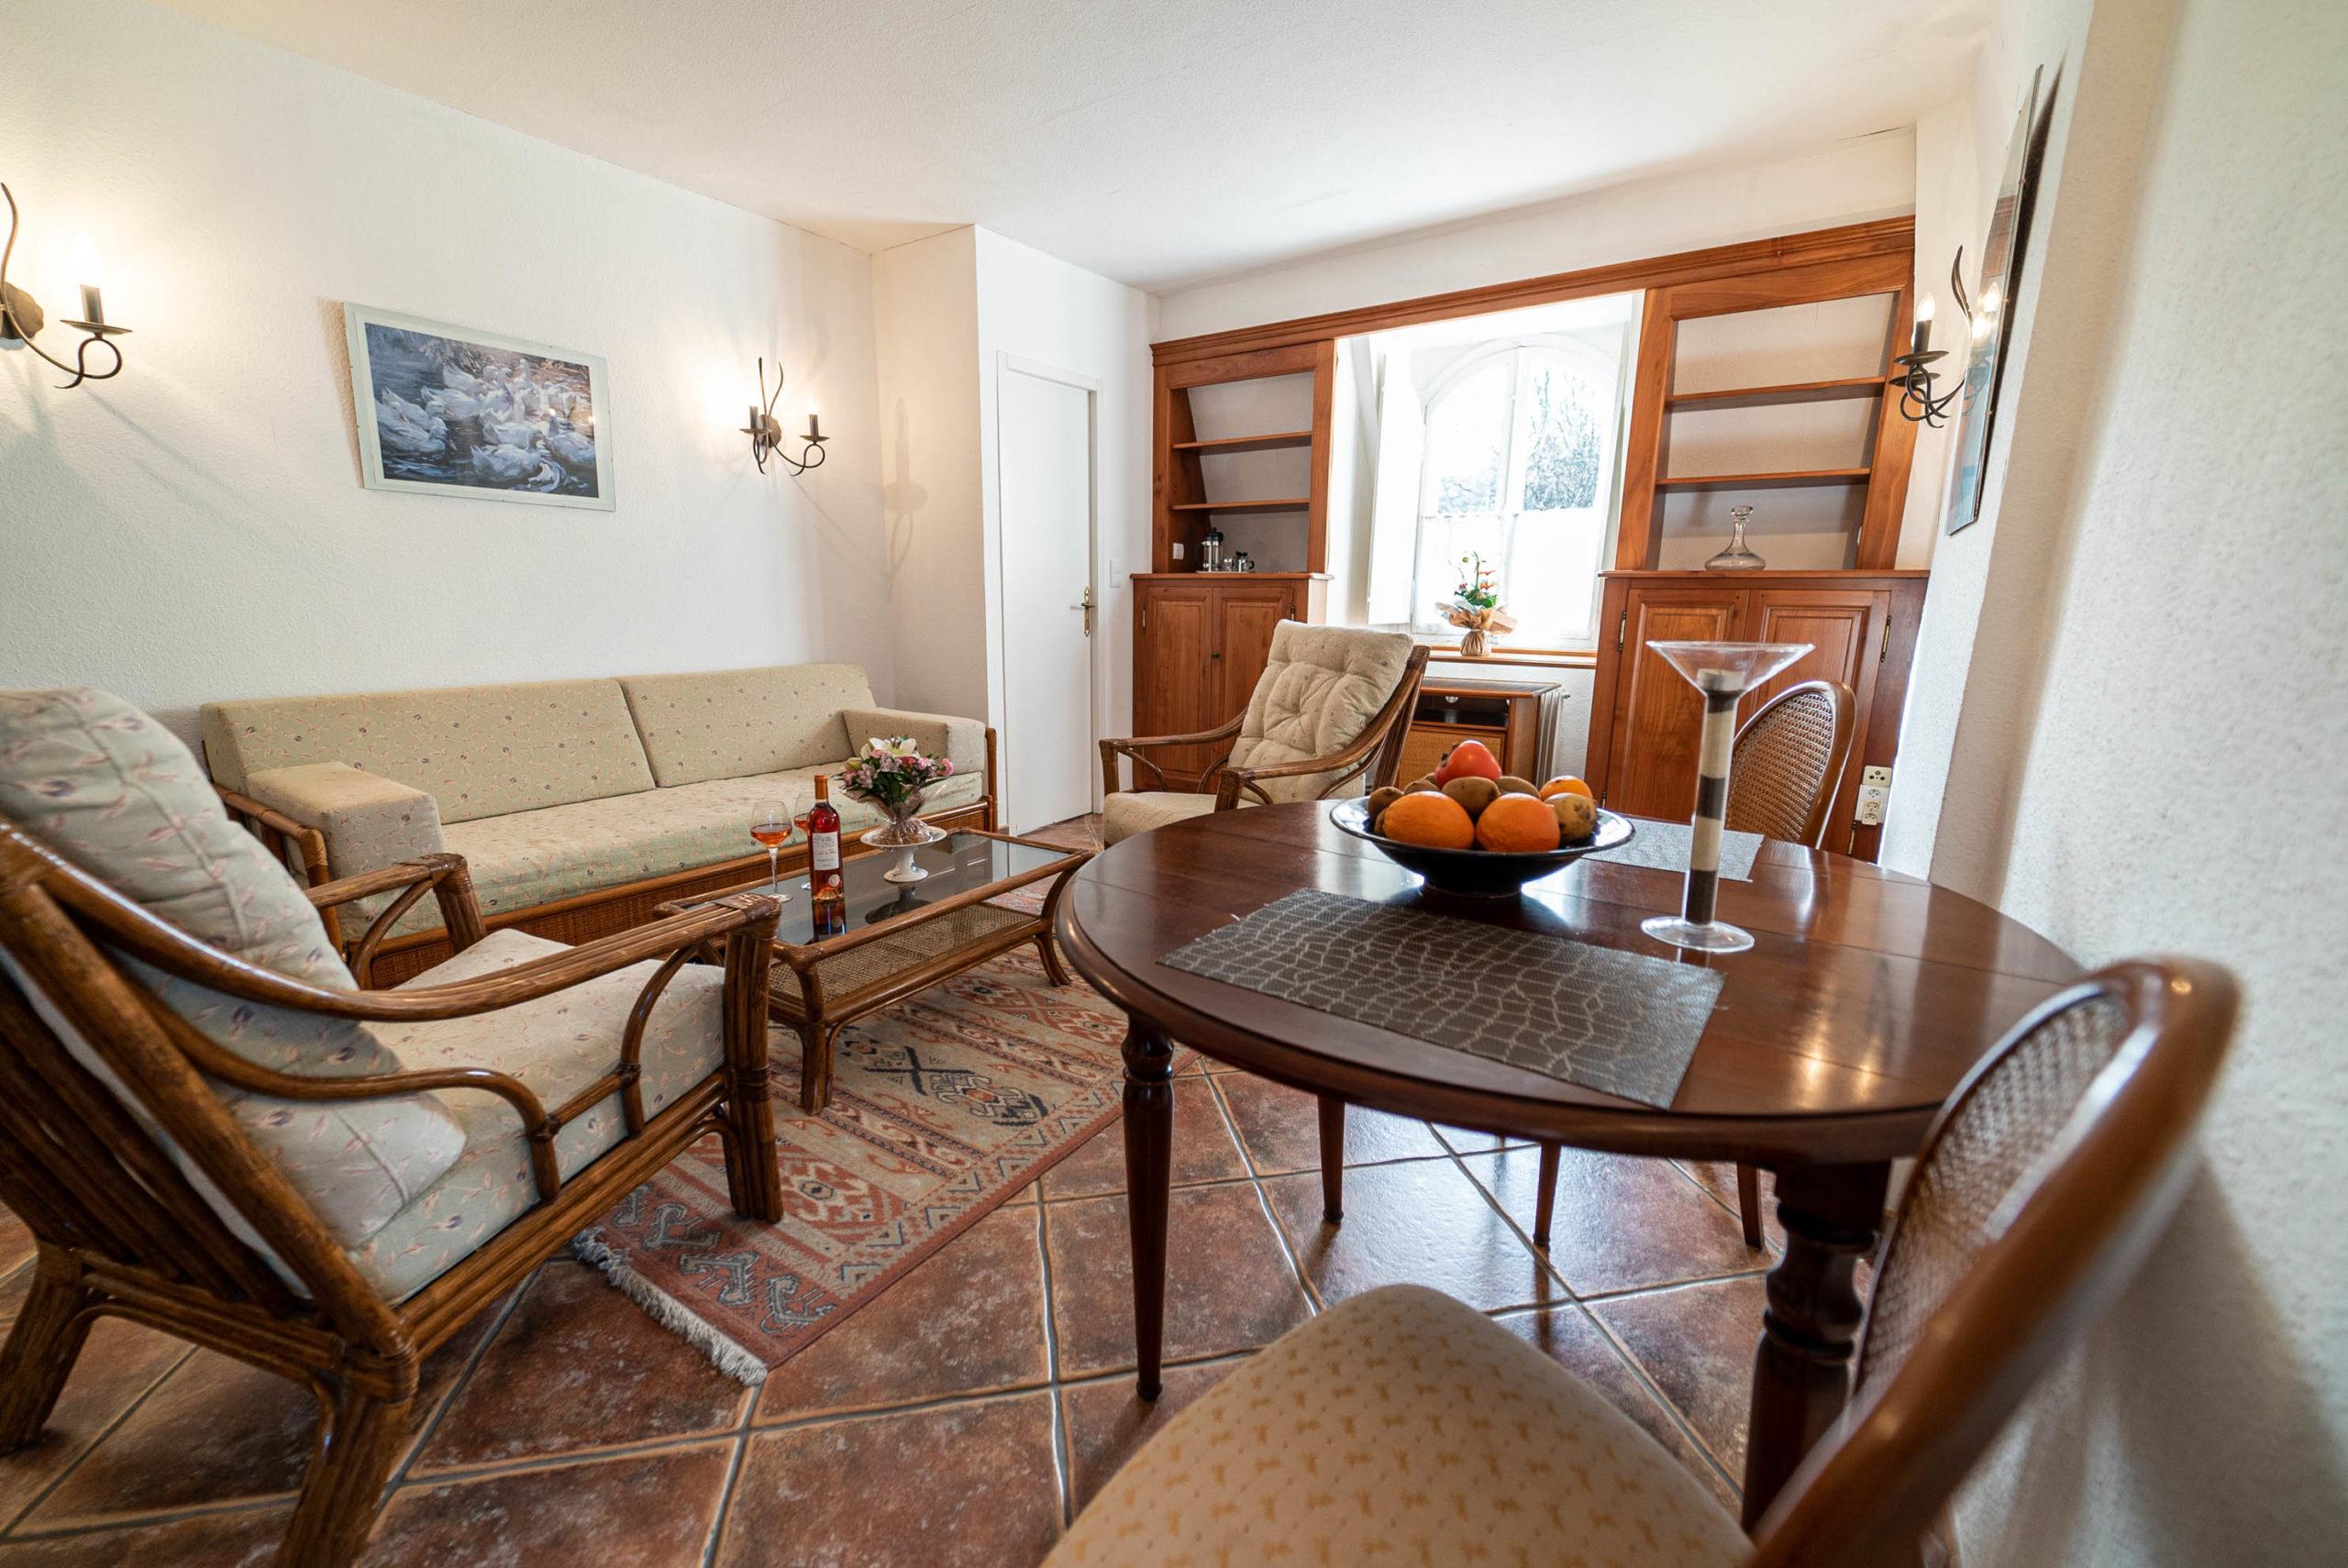 Salon suite nuptiale chateau Rauly location bergerac Monbazillac